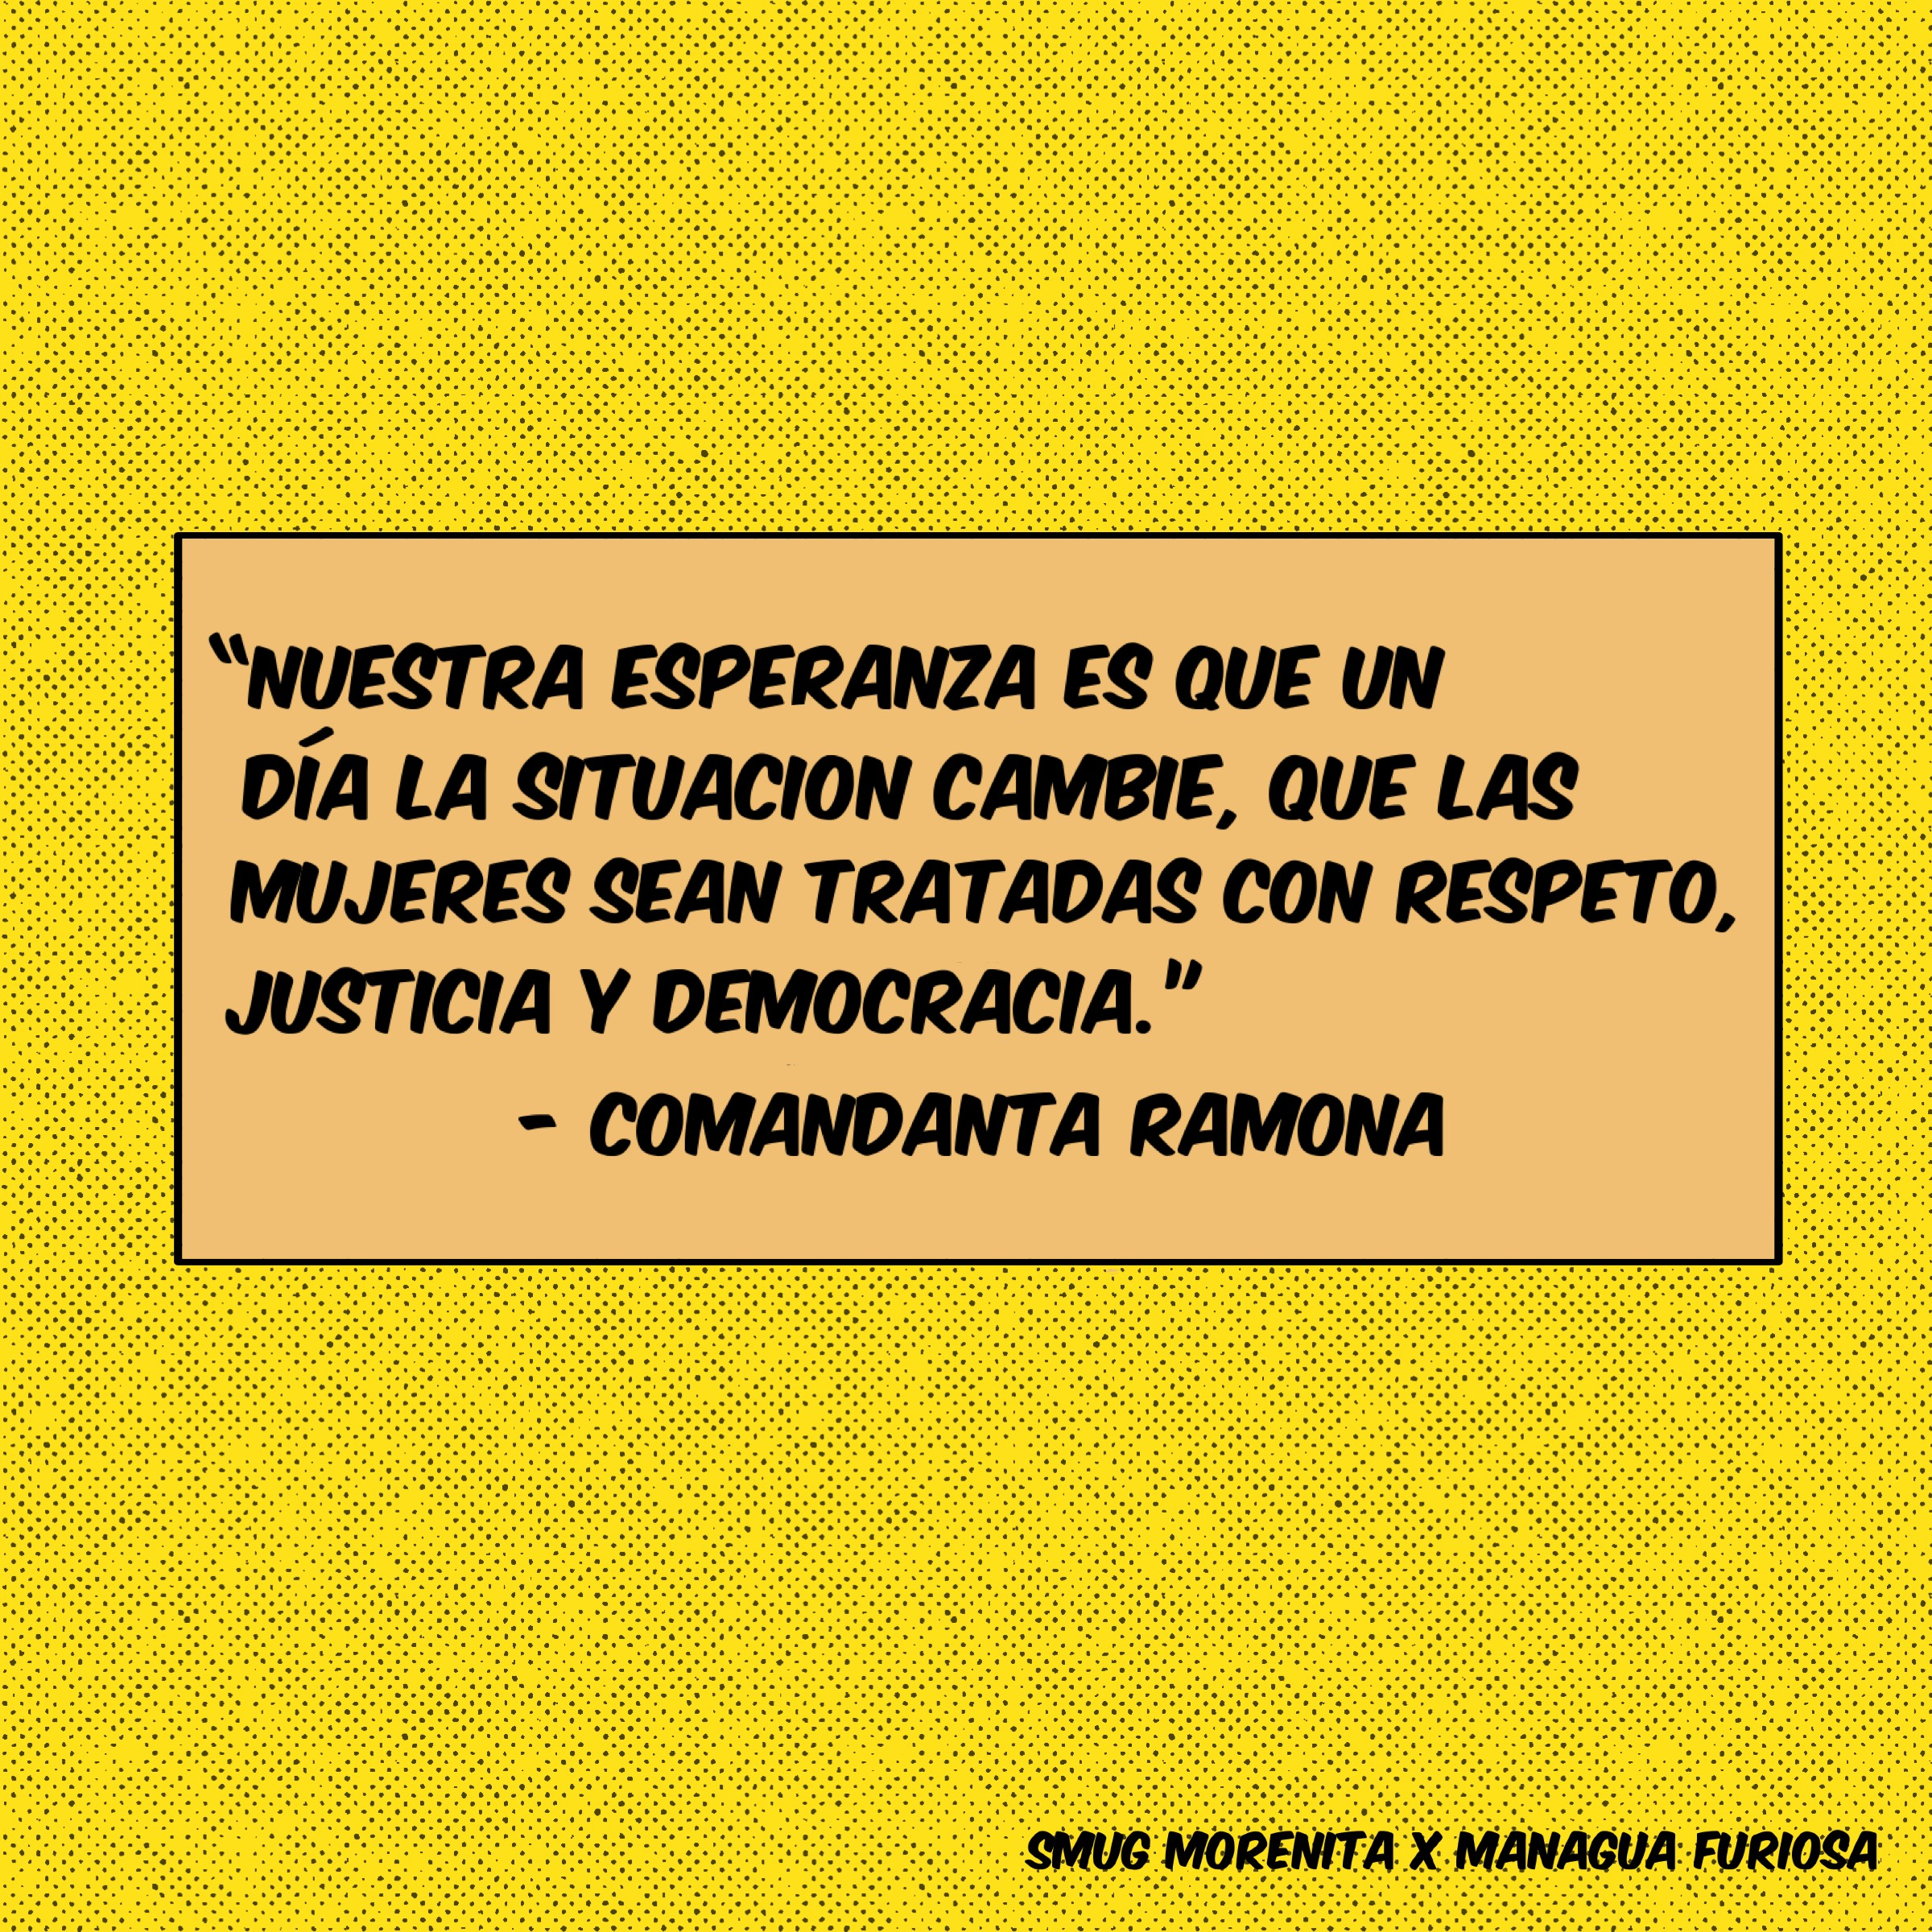 Comandanta Ramona Quote - Web Image .jpeg